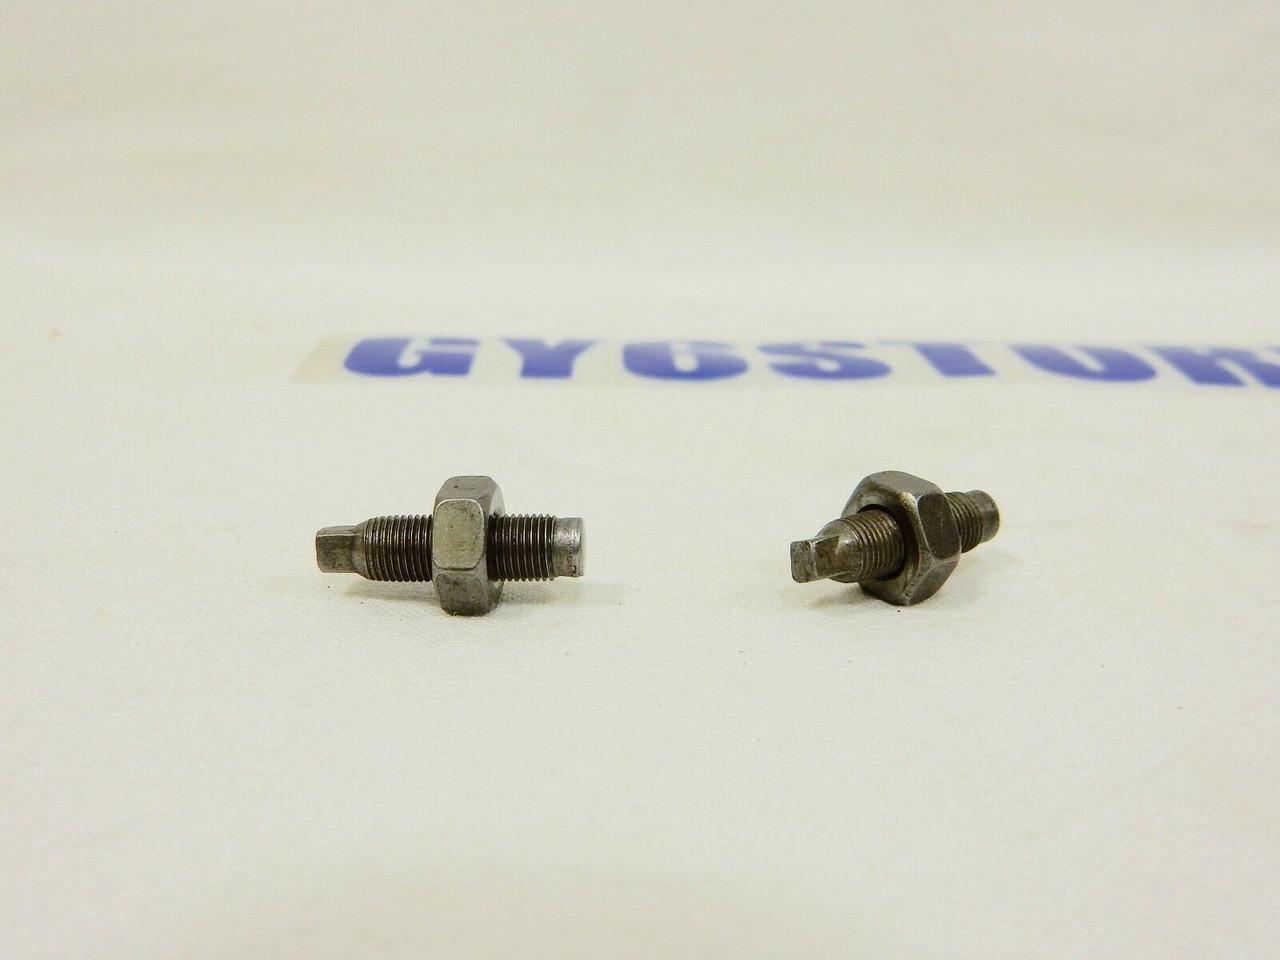 Gy6 valve adjustment